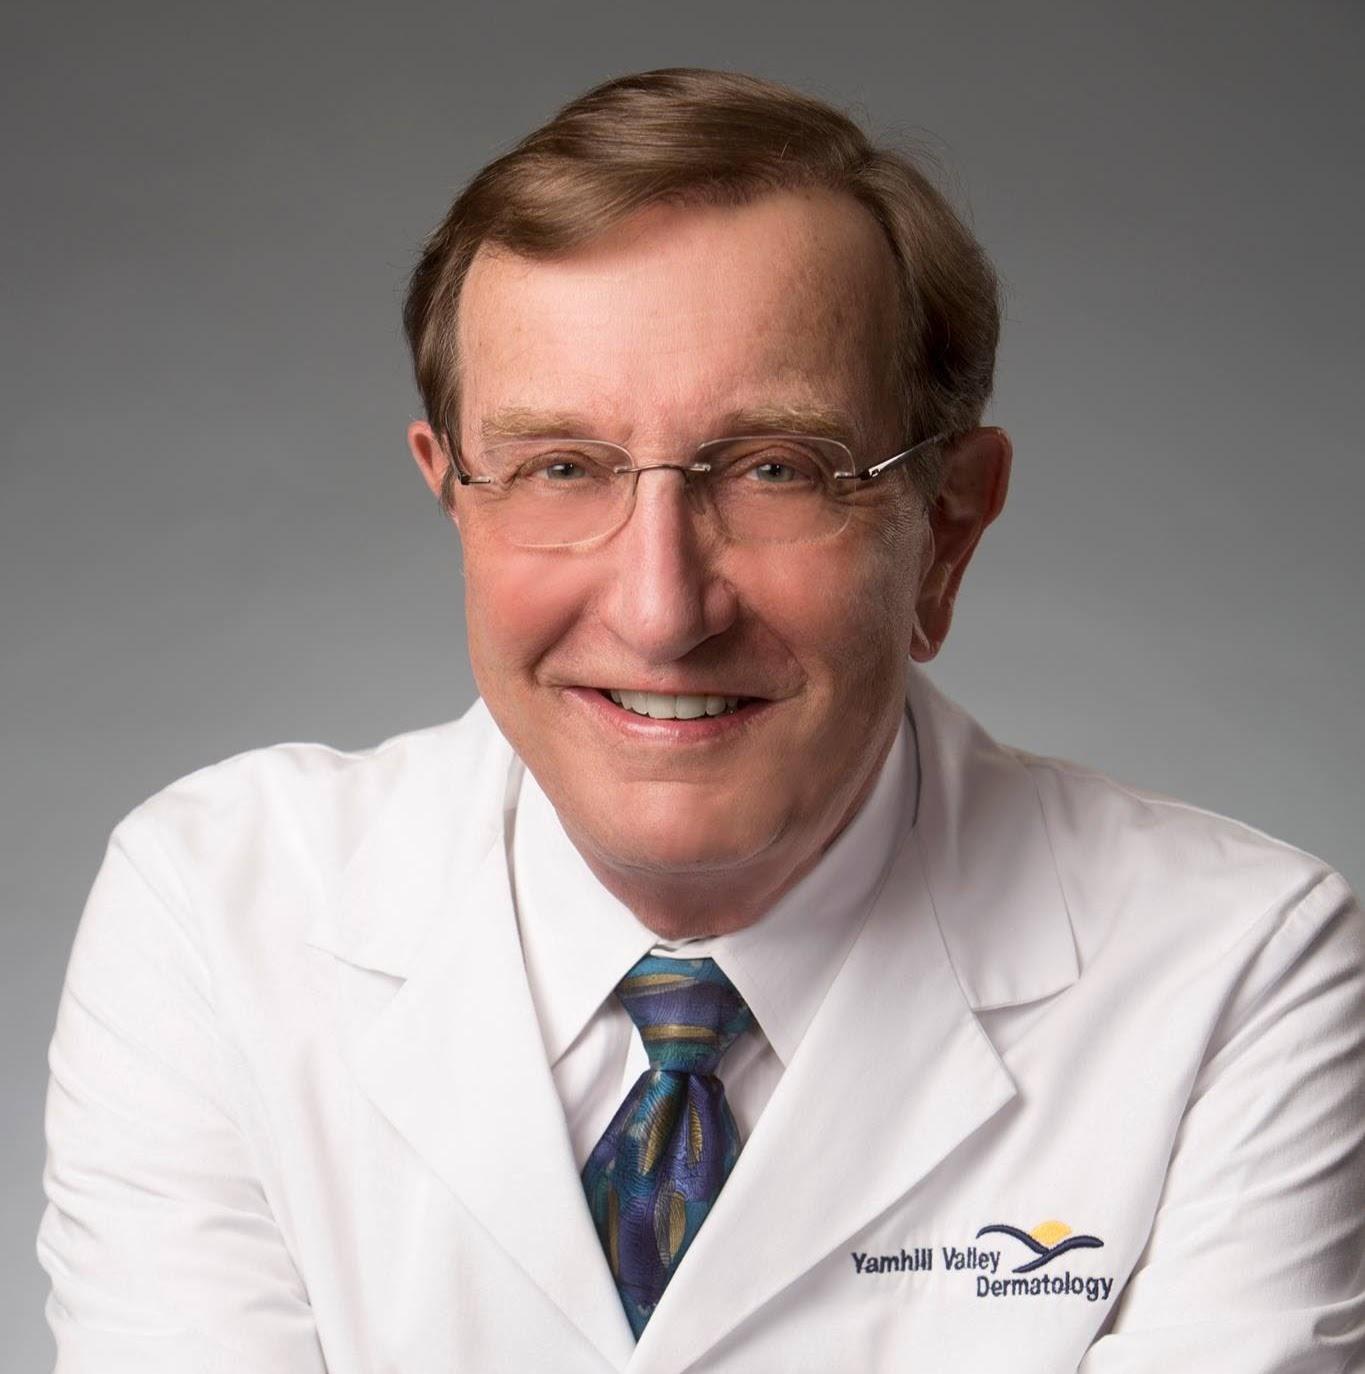 Yamhill Valley Dermatology & Laser Center - Richard I. Ecker M.D. | 706 NE Evans St, McMinnville, OR, 97128 | +1 (503) 472-1405